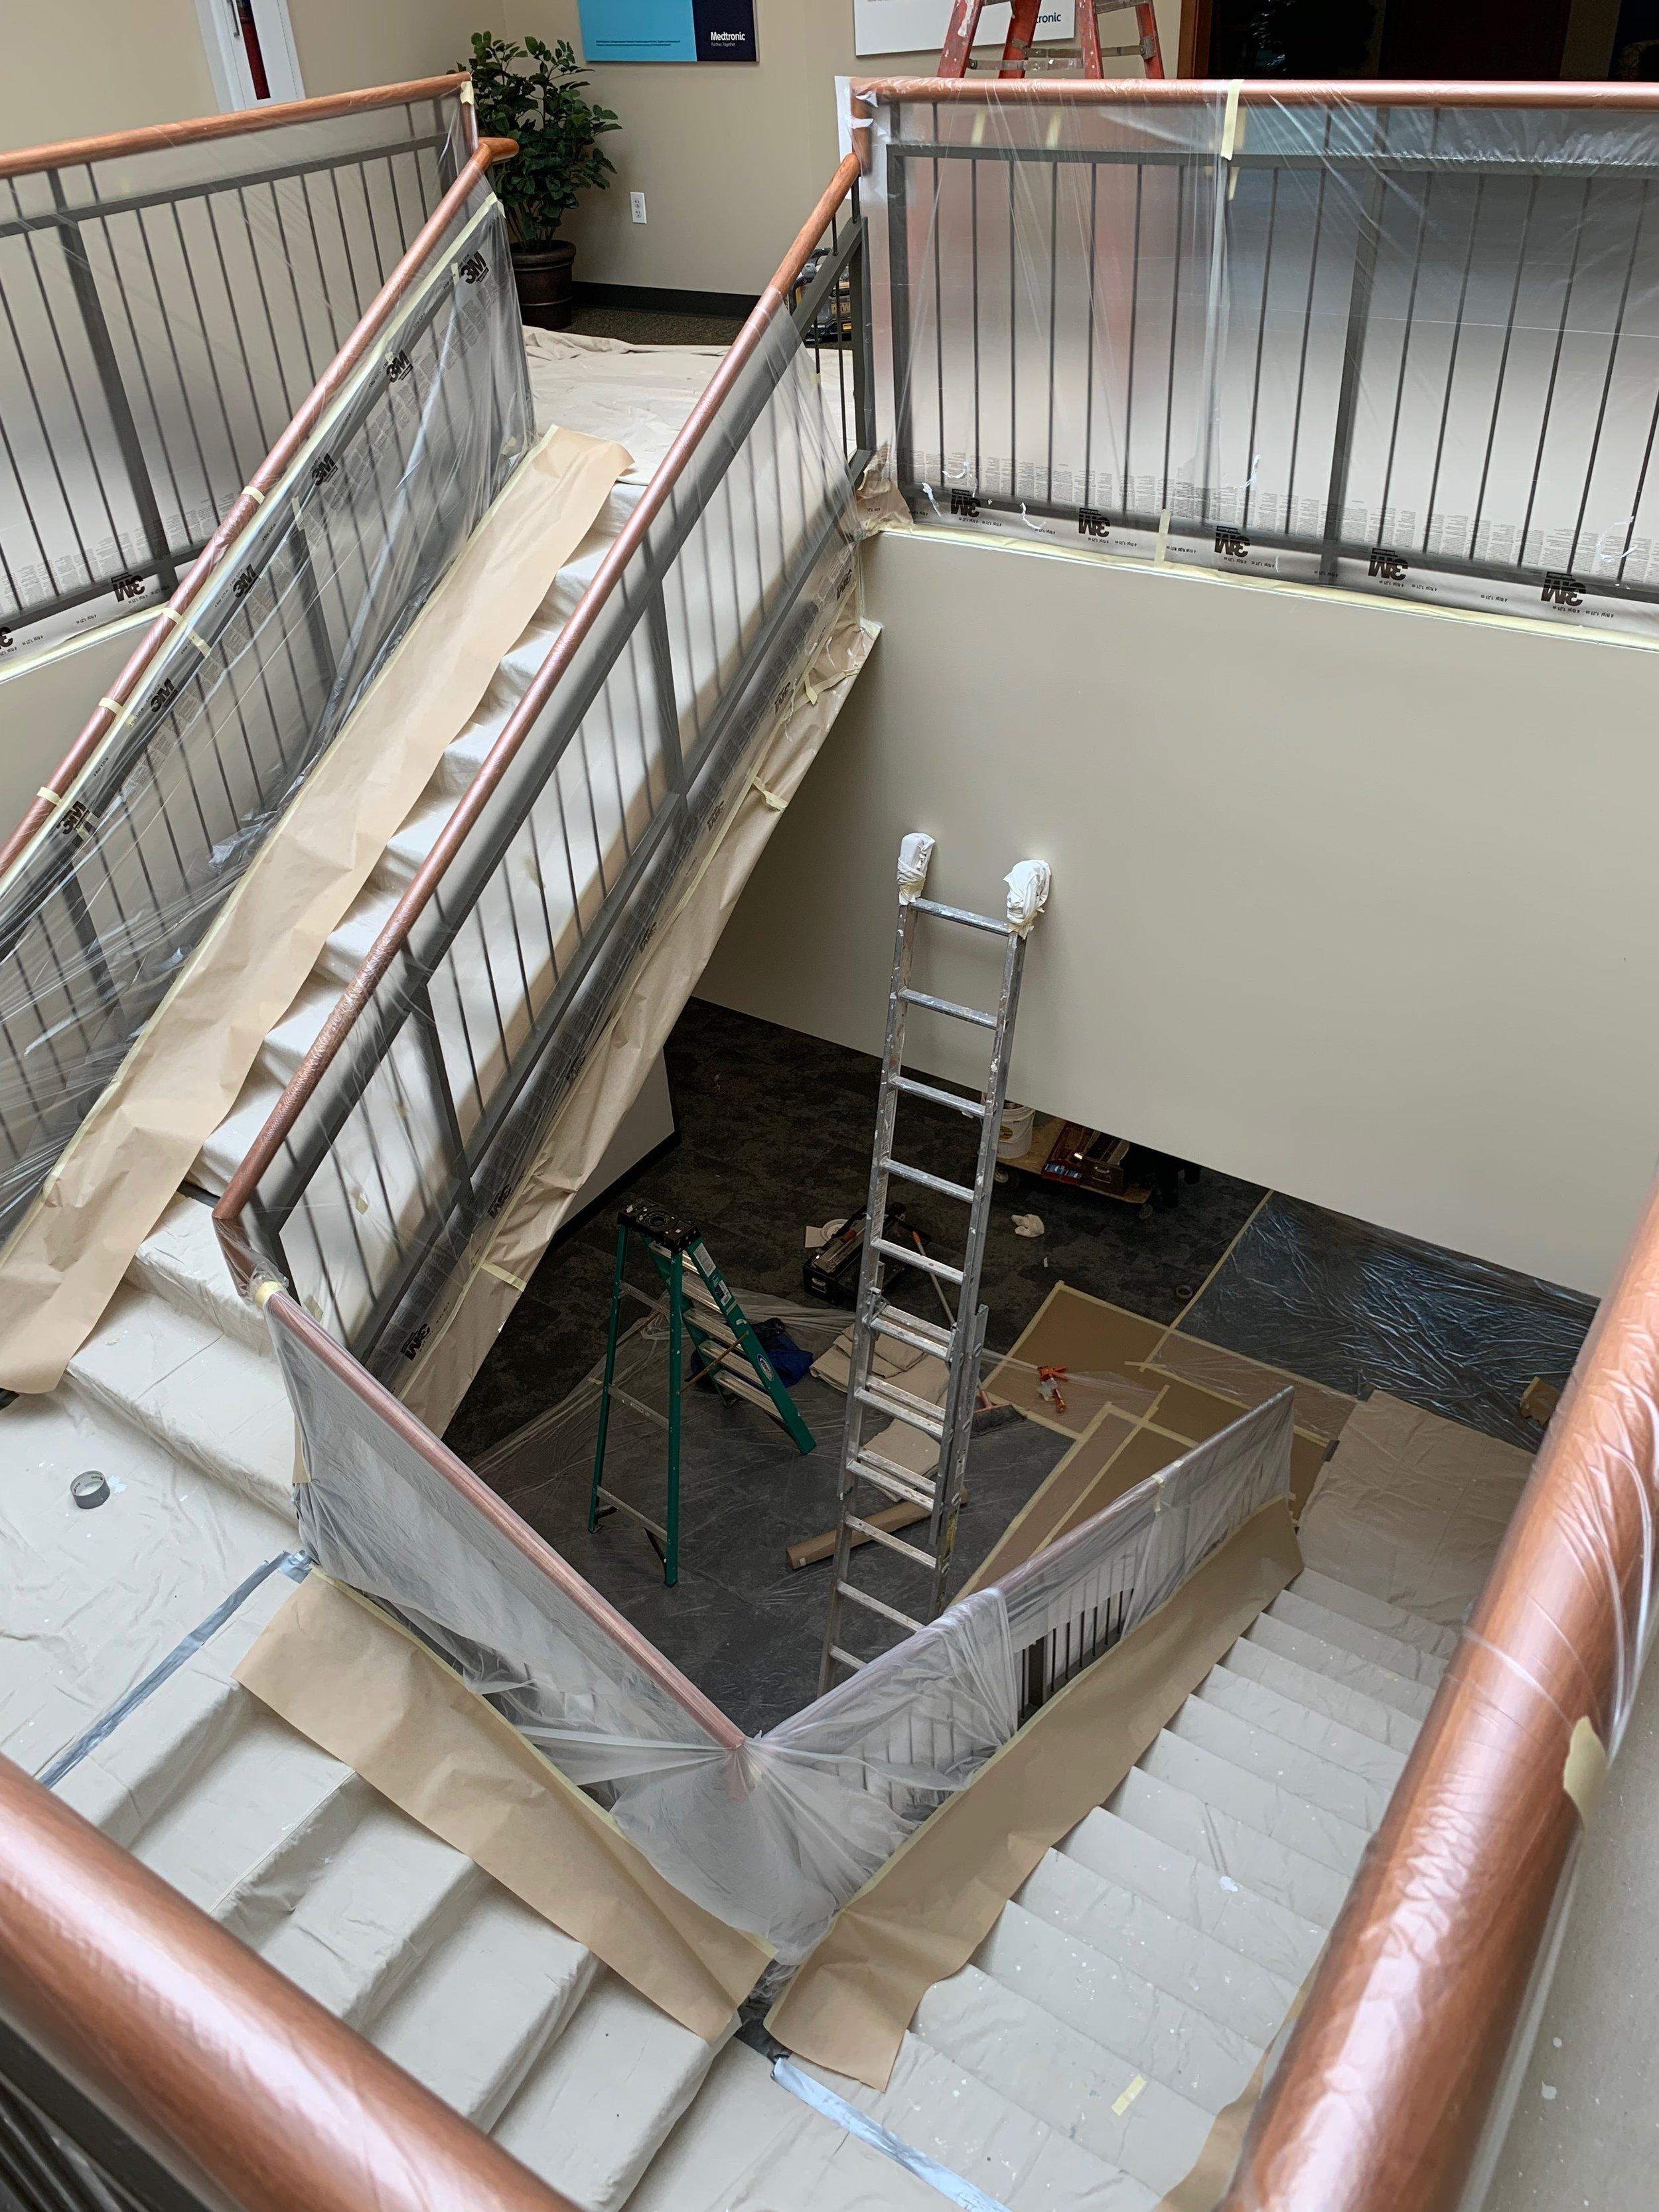 med Tronic core stairwell prep 4-27-19 #3.JPG